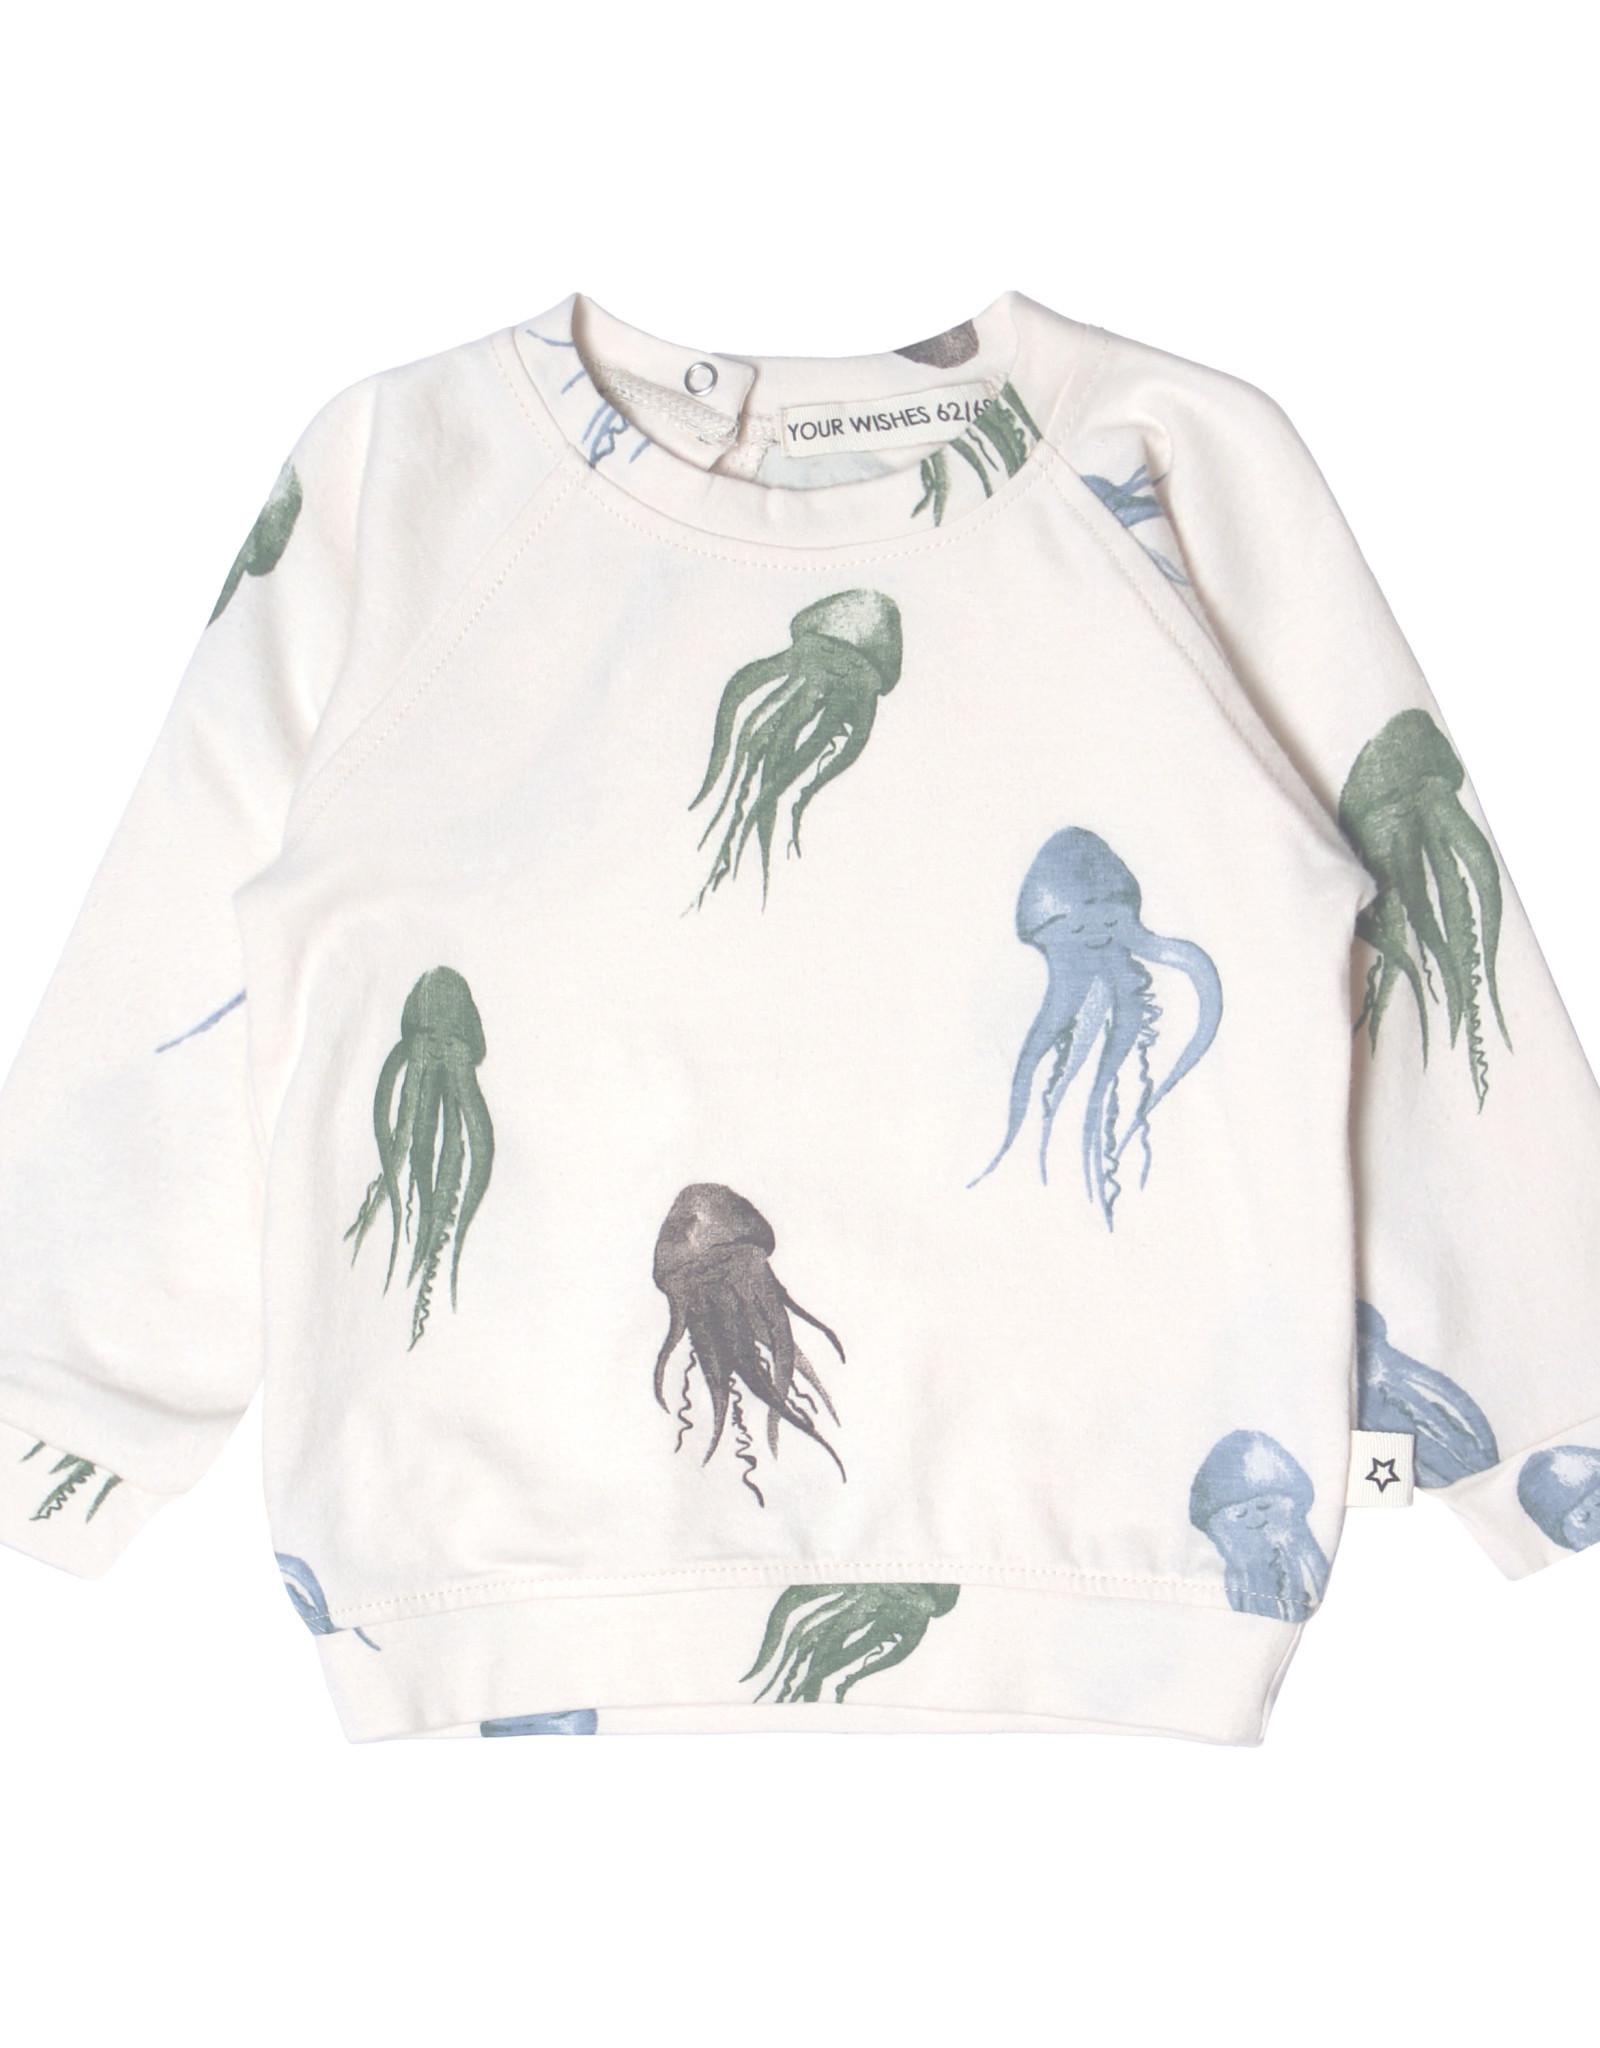 Your Wishes Your Wishes Jellyfish Sweatshirt